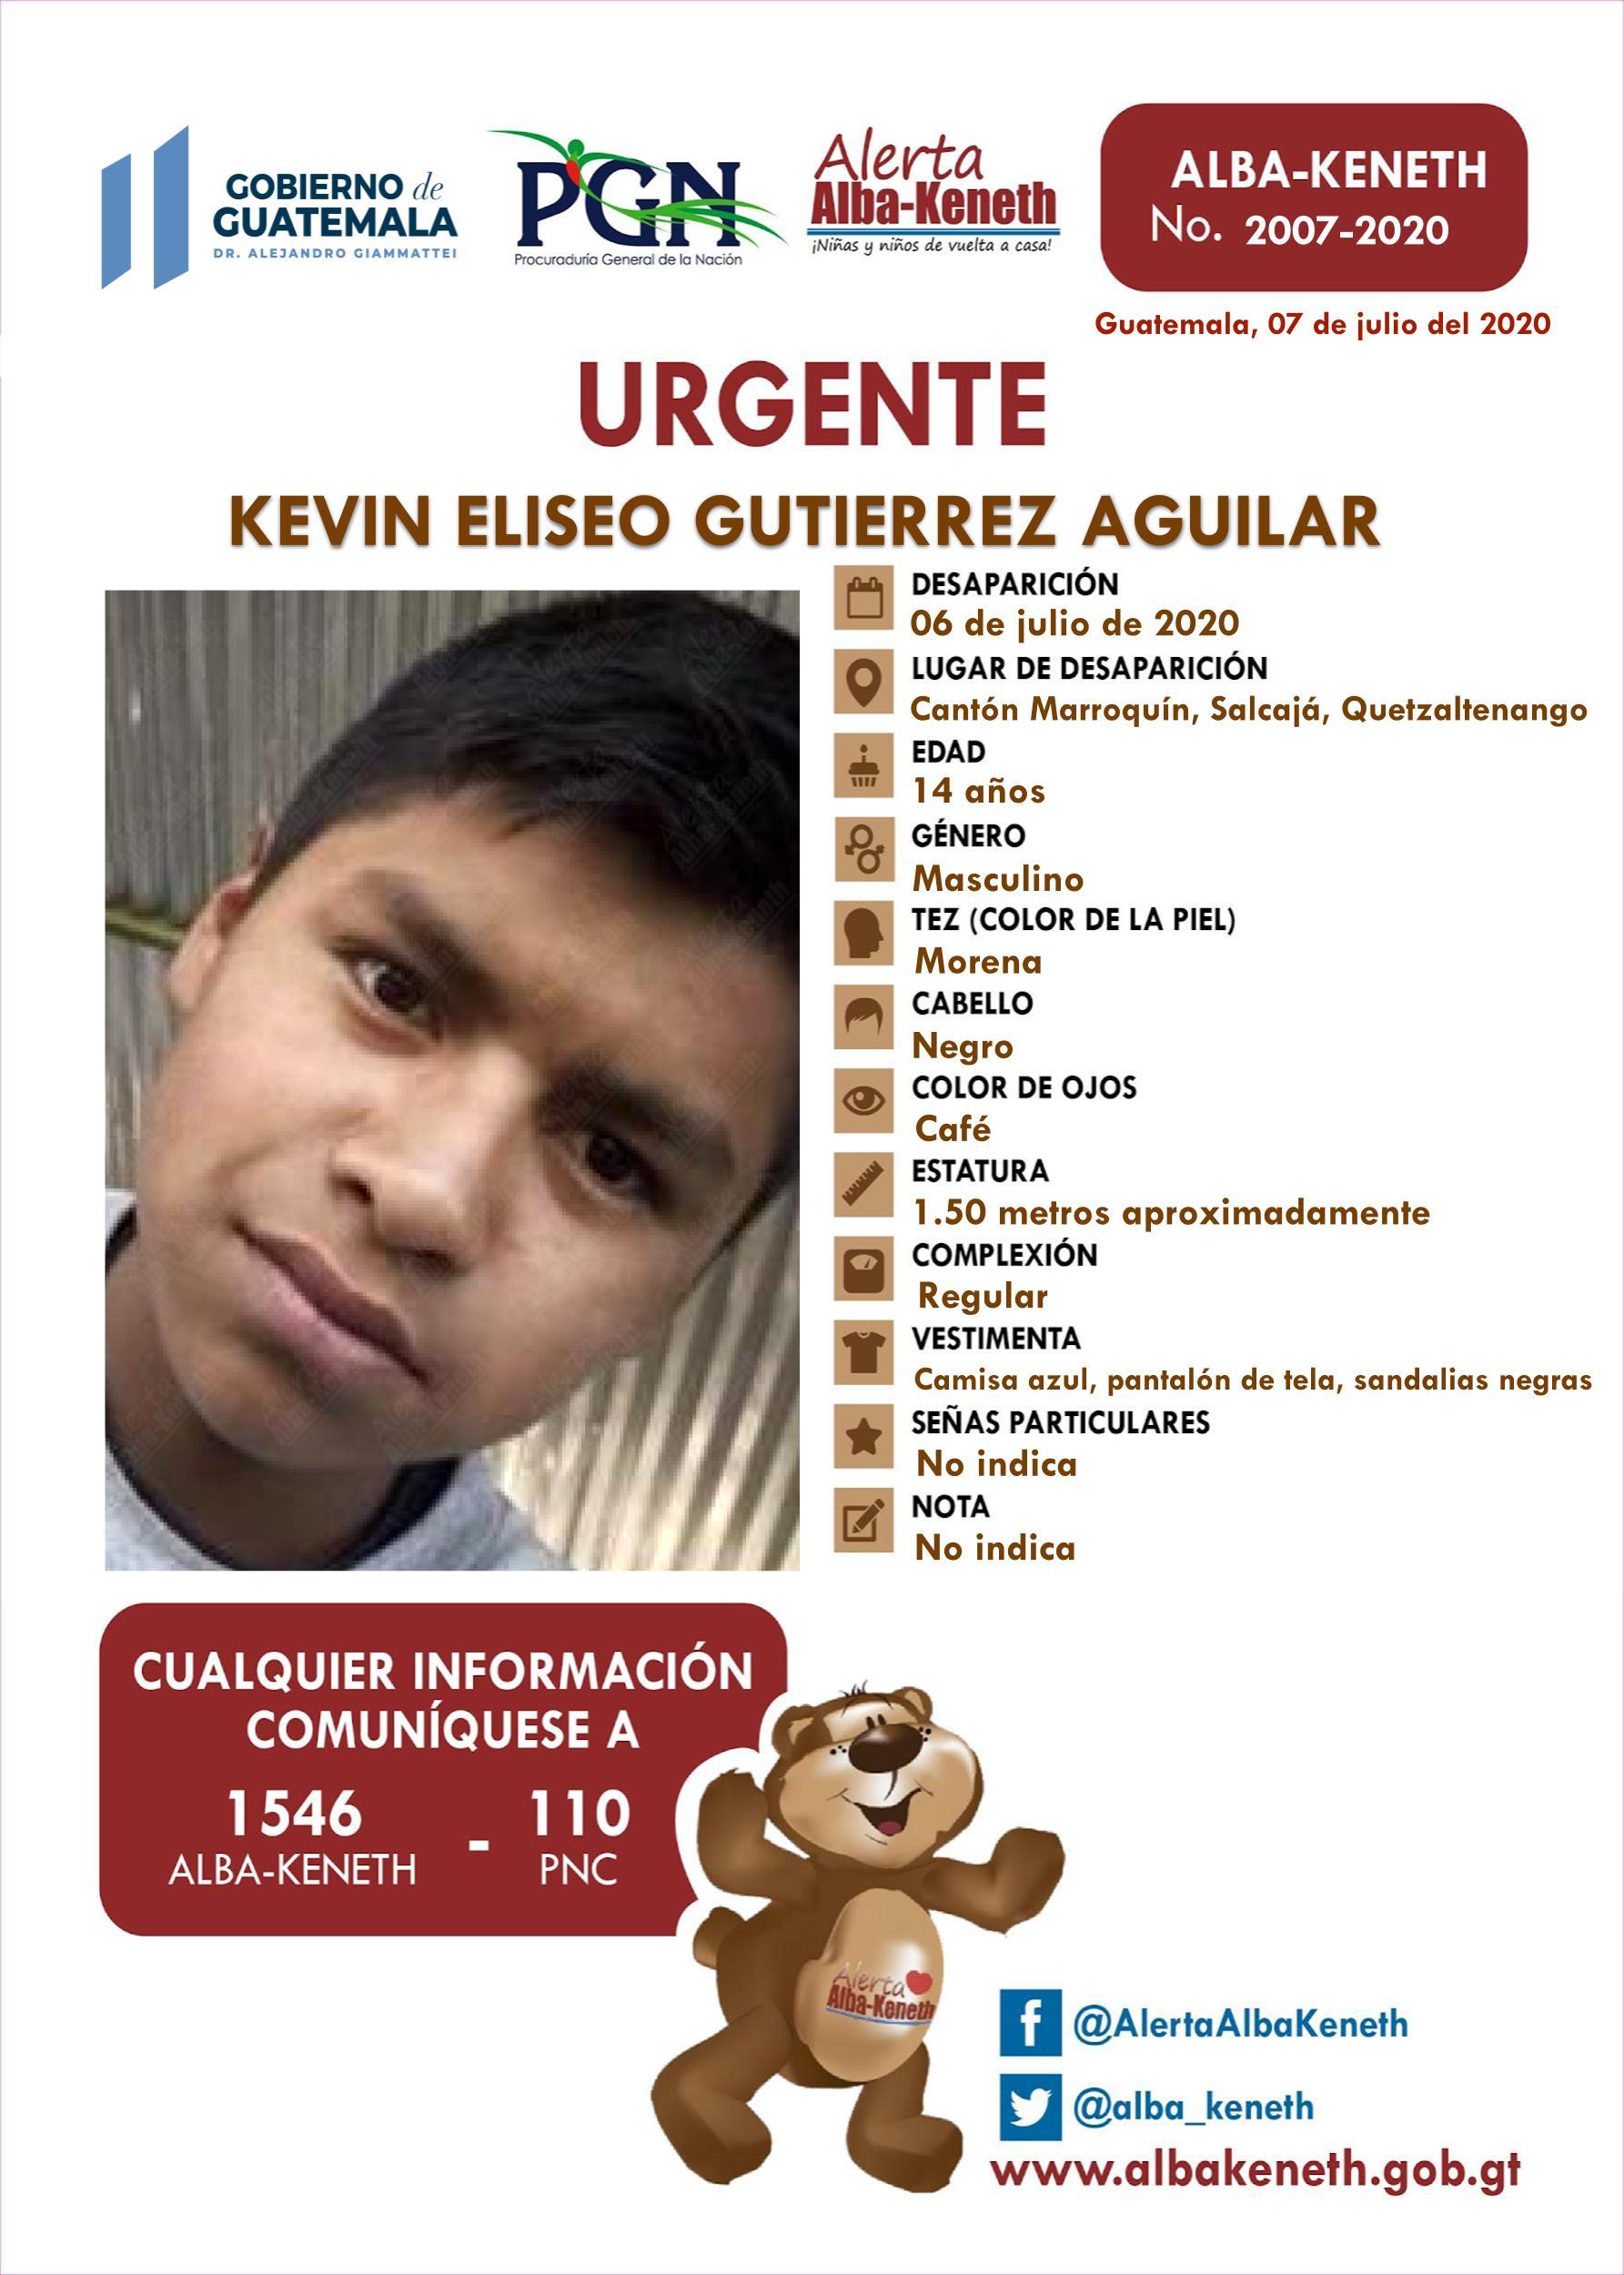 Kevin Eliseo Gutierrez Aguilar